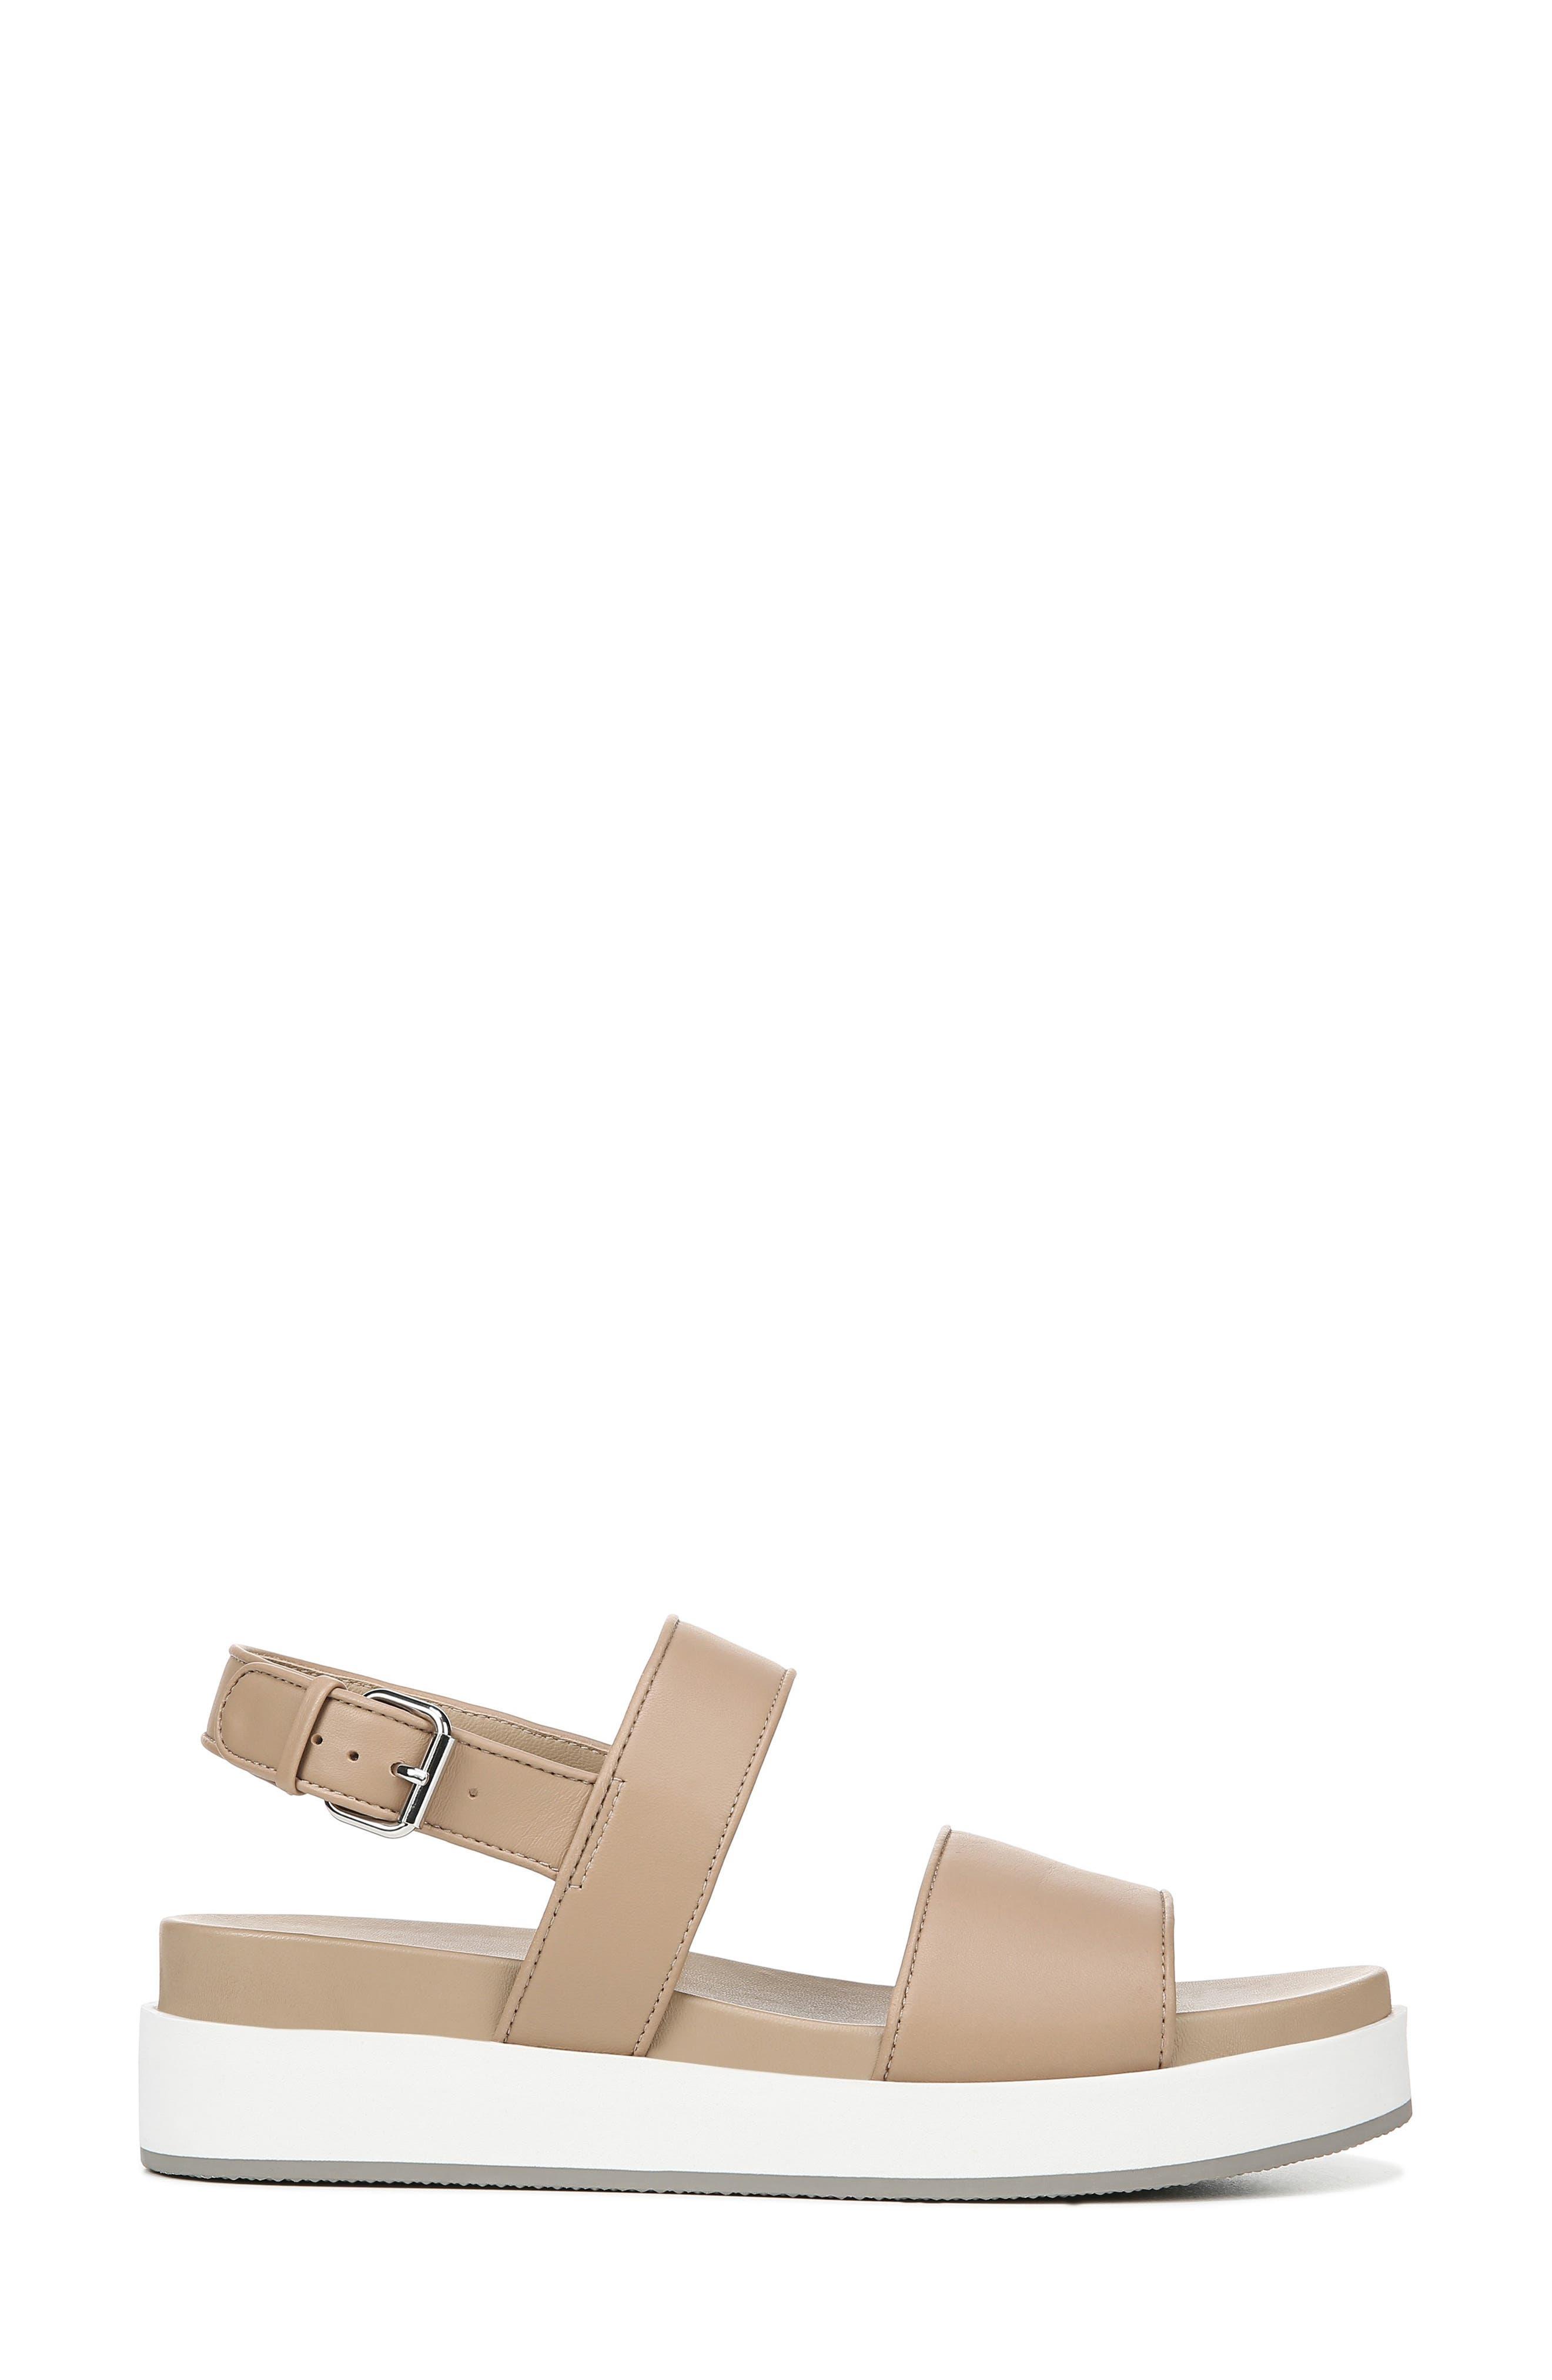 VIA SPIGA, Davi Platform Sandal, Alternate thumbnail 3, color, DESERT NAPPA